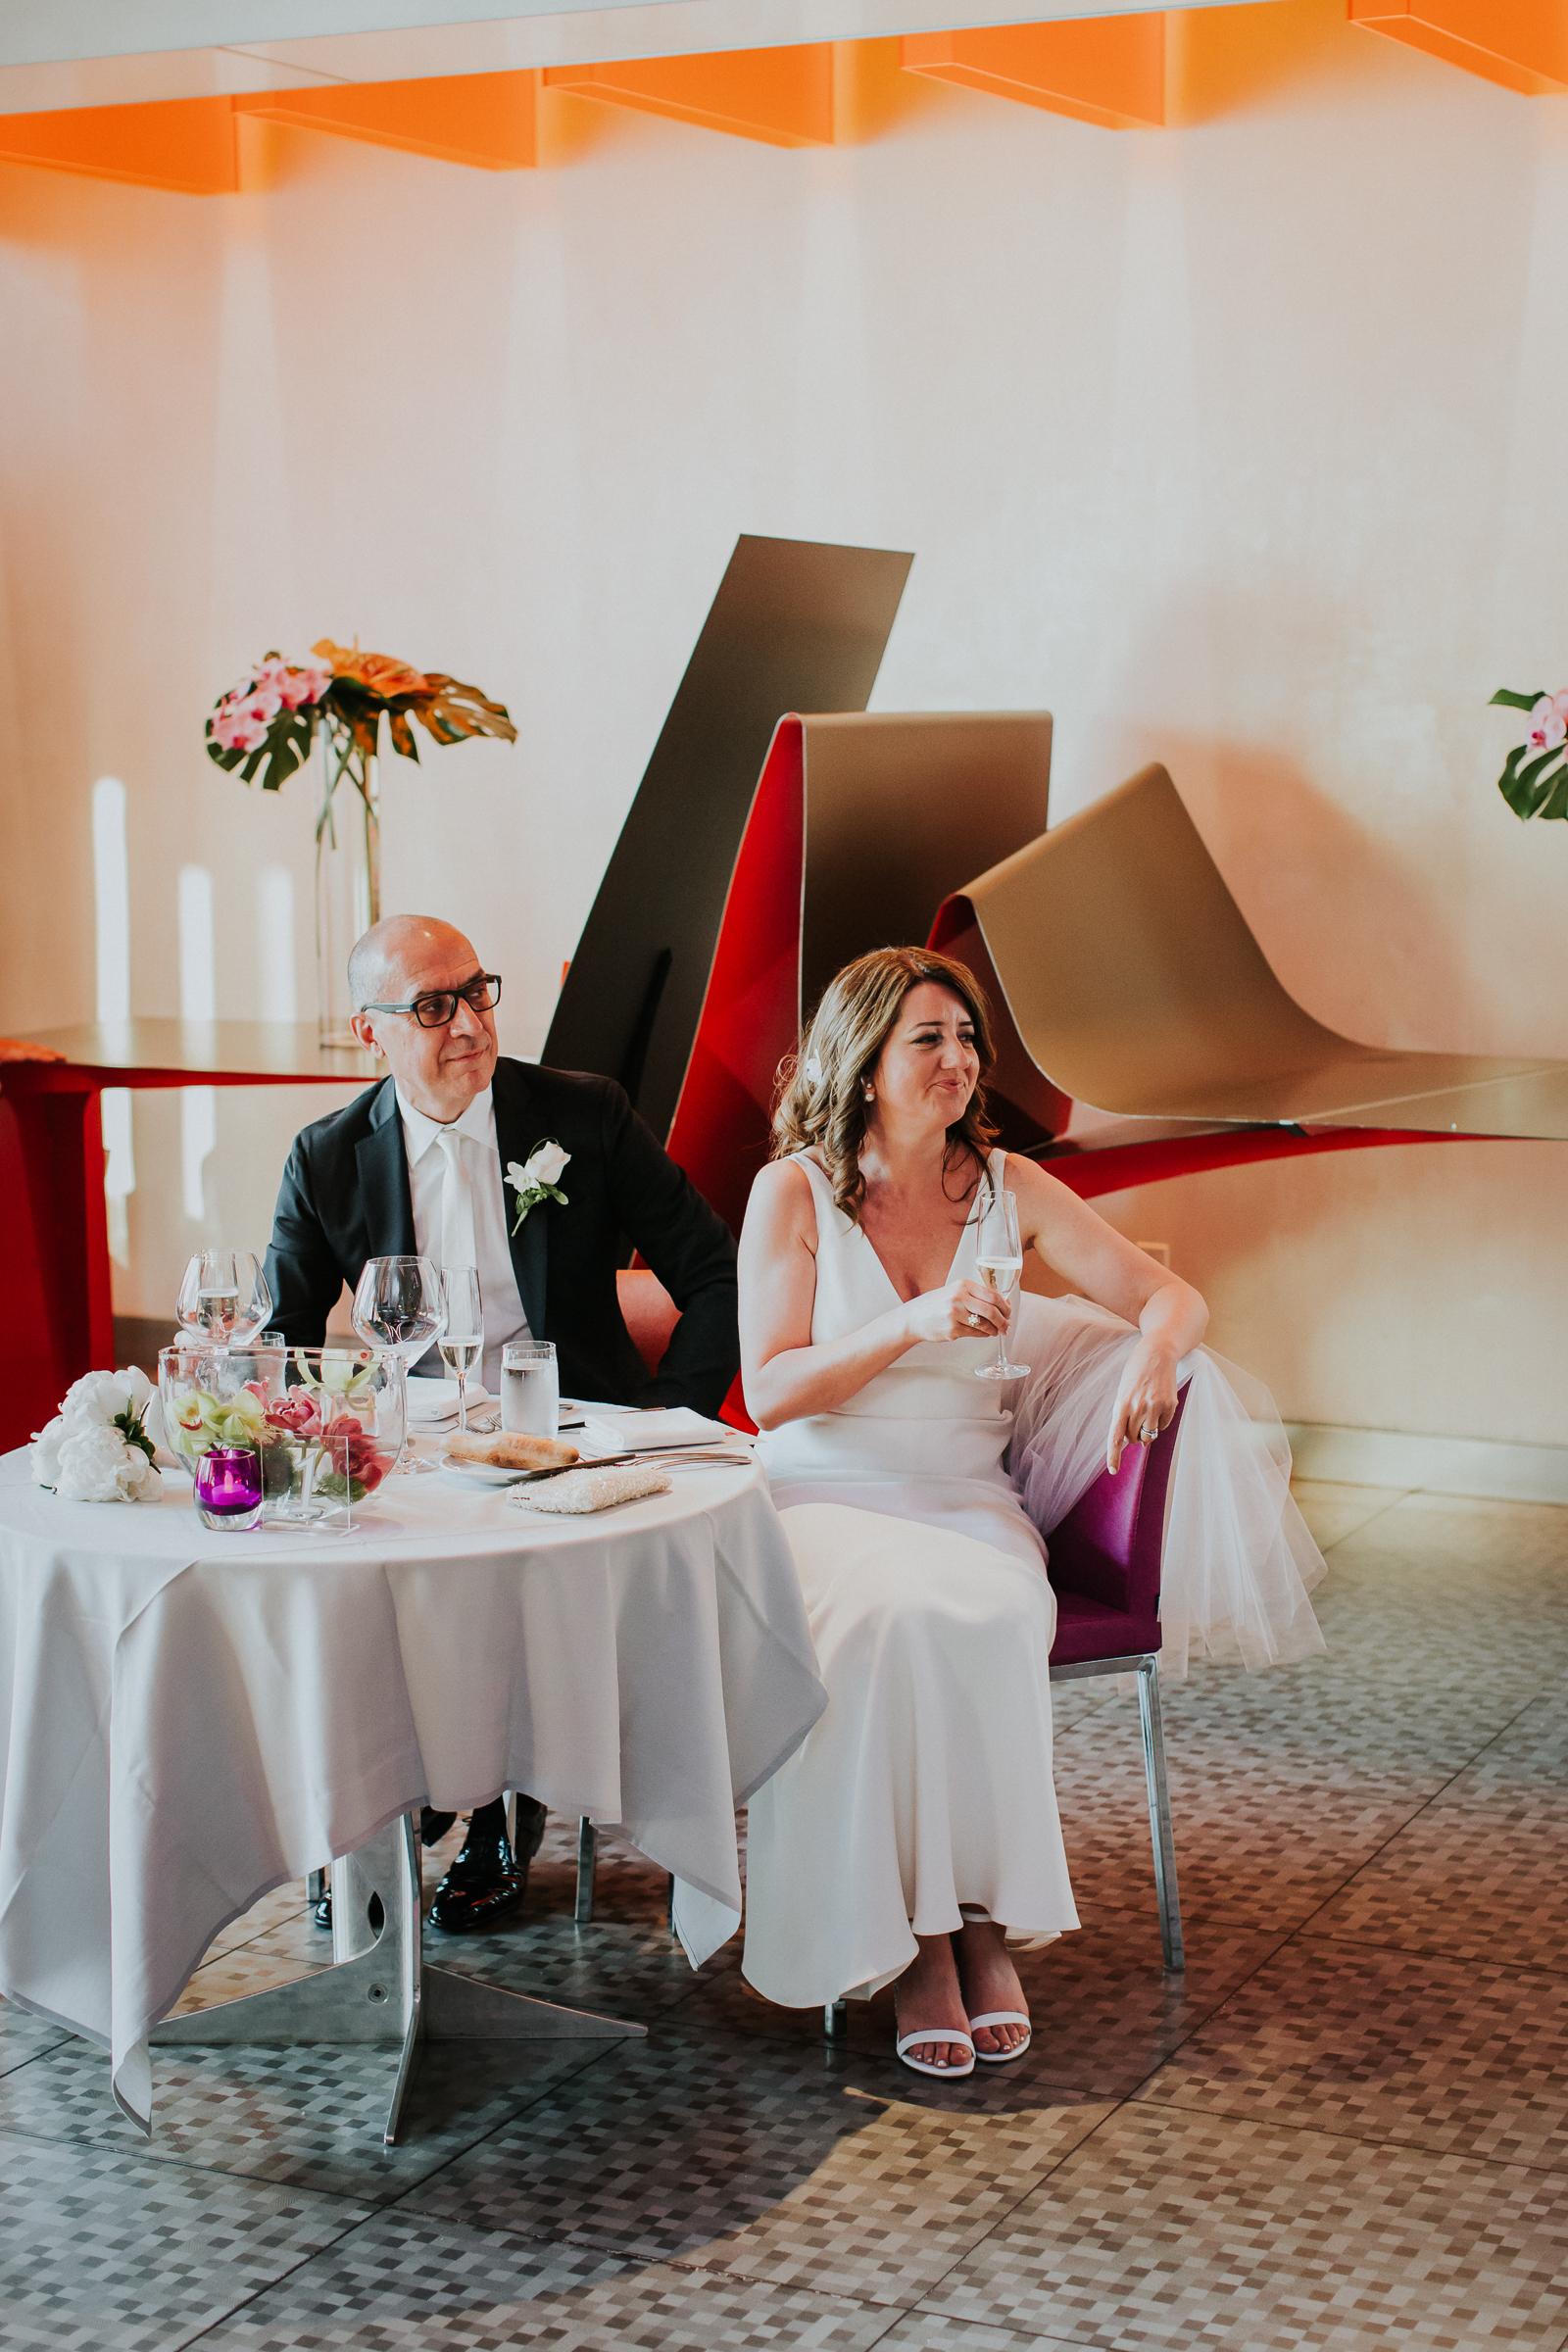 Robert-NYC-Museum-Of-Arts-&-Design-Greek-Italian-New-York-Documentary-Wedding-Photographer-56.jpg